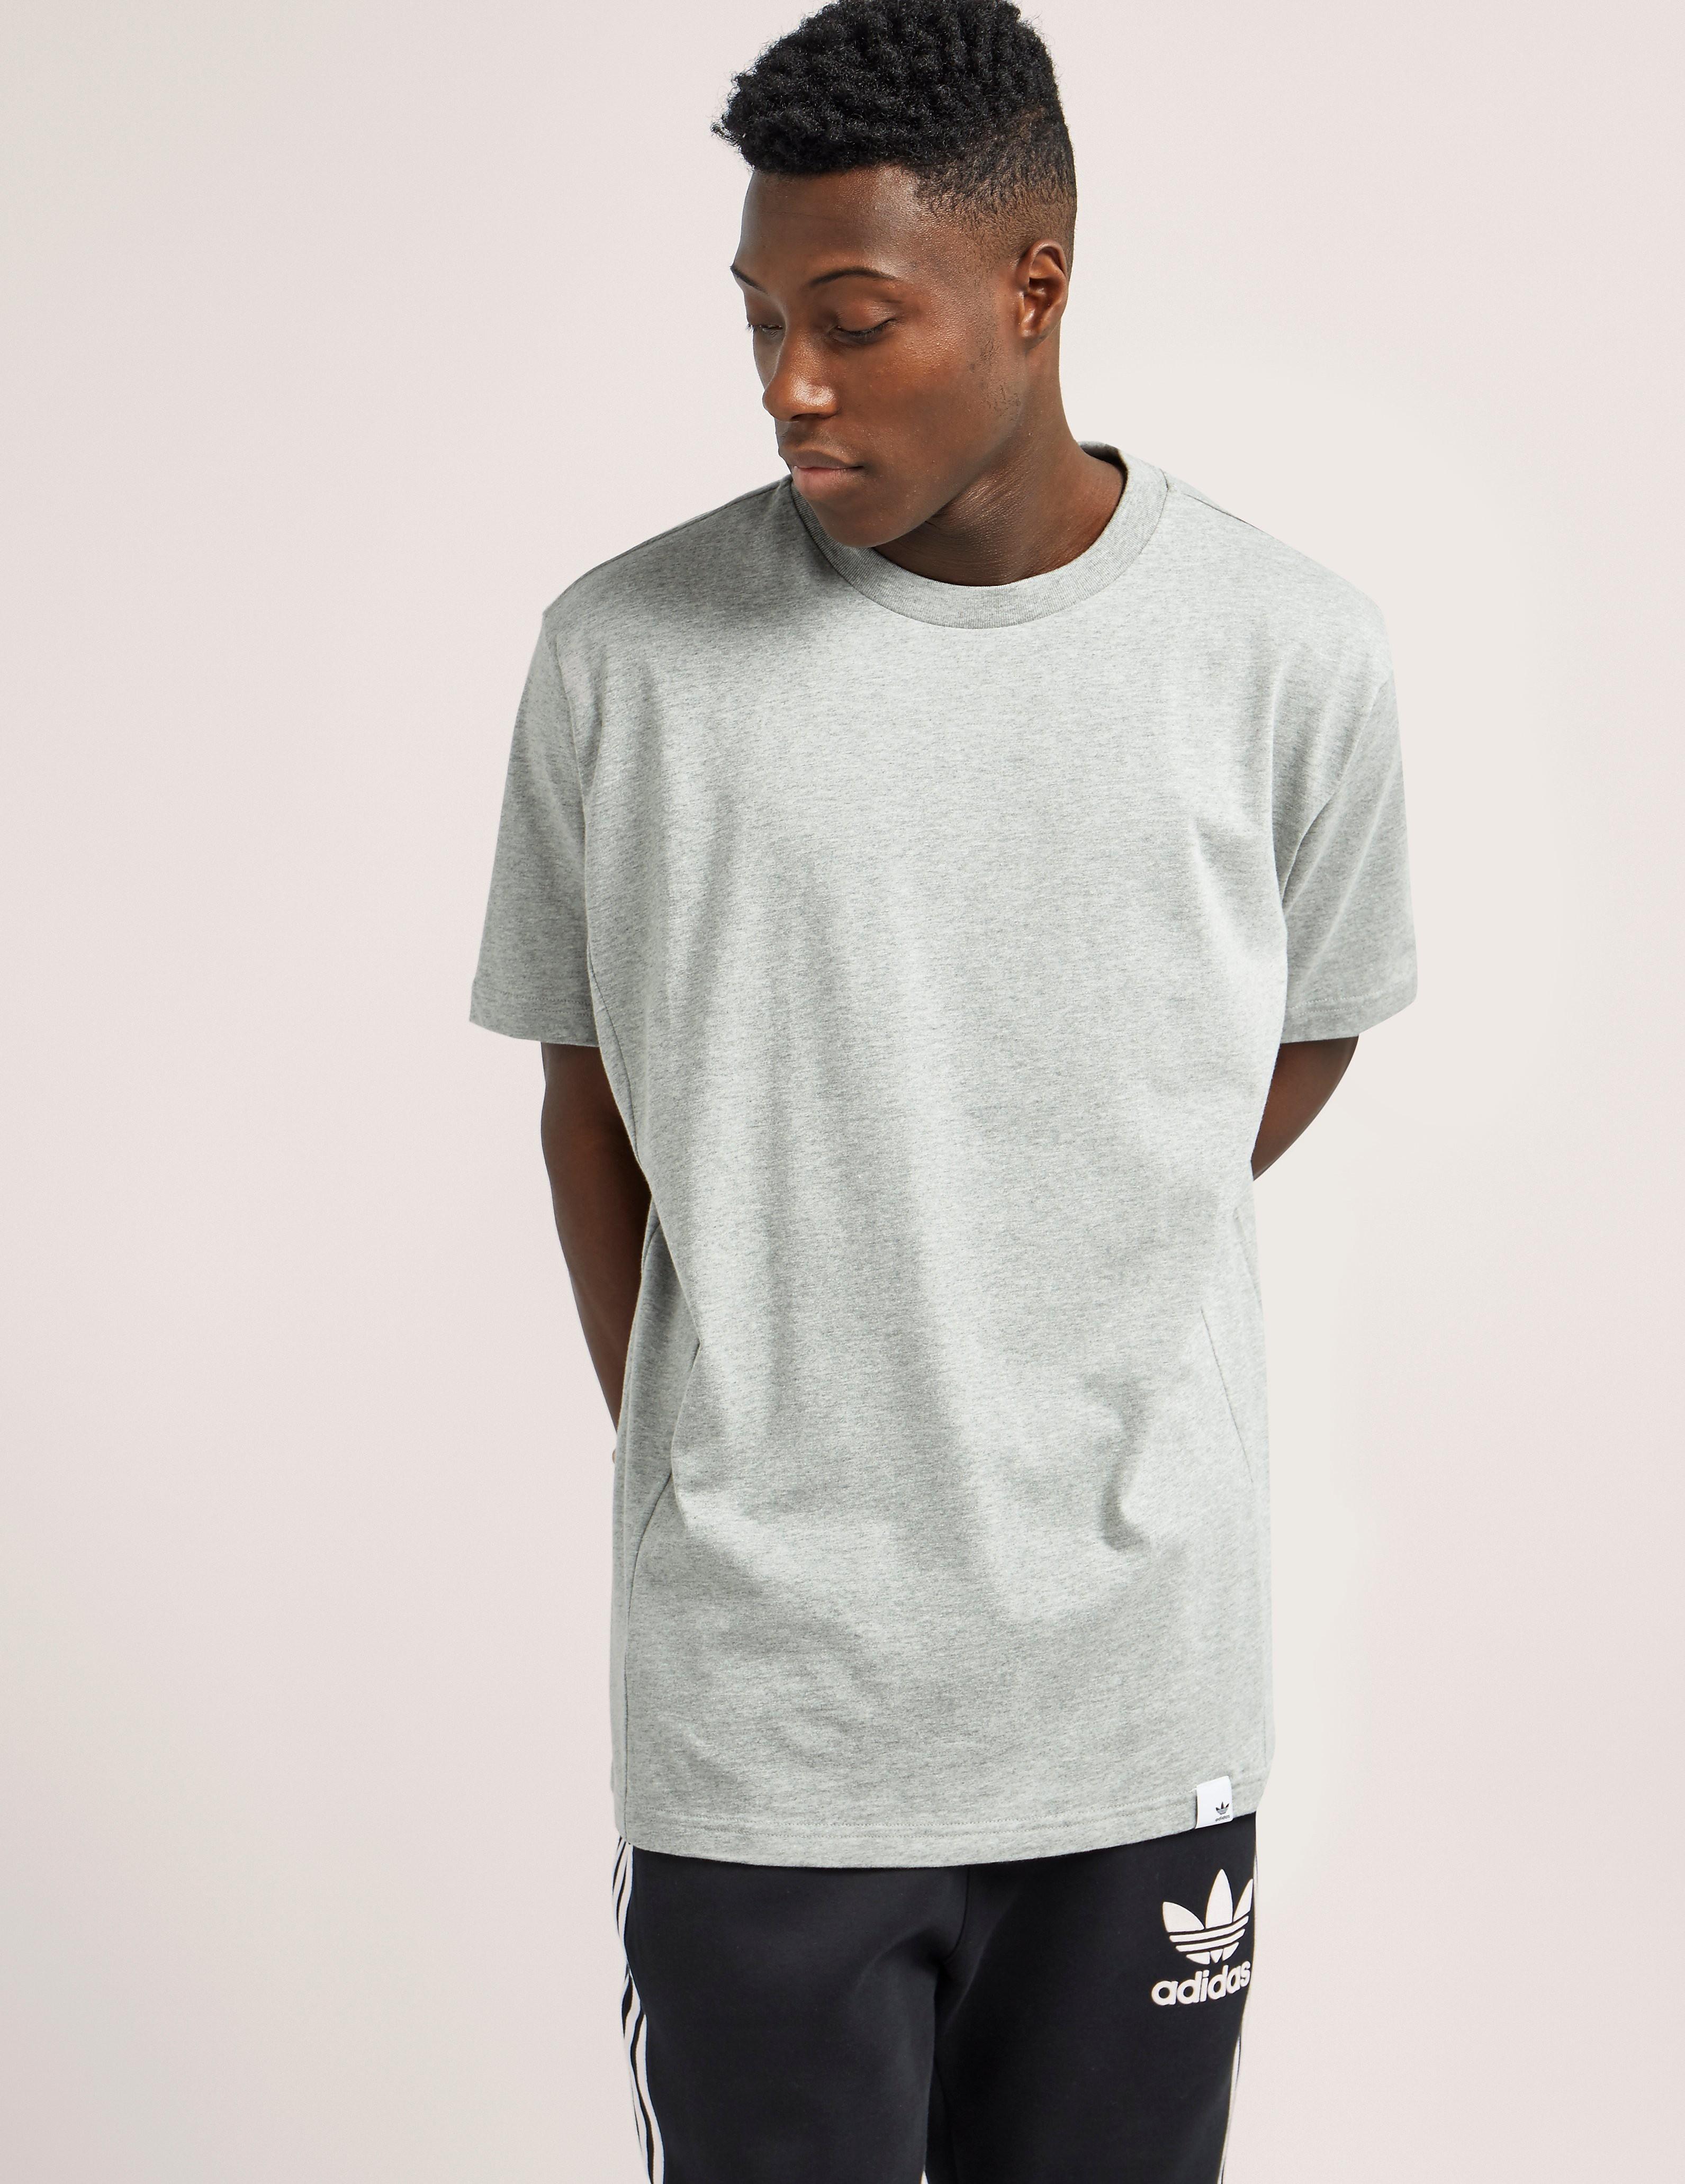 adidas Originals XBYO Crew T-Shirt